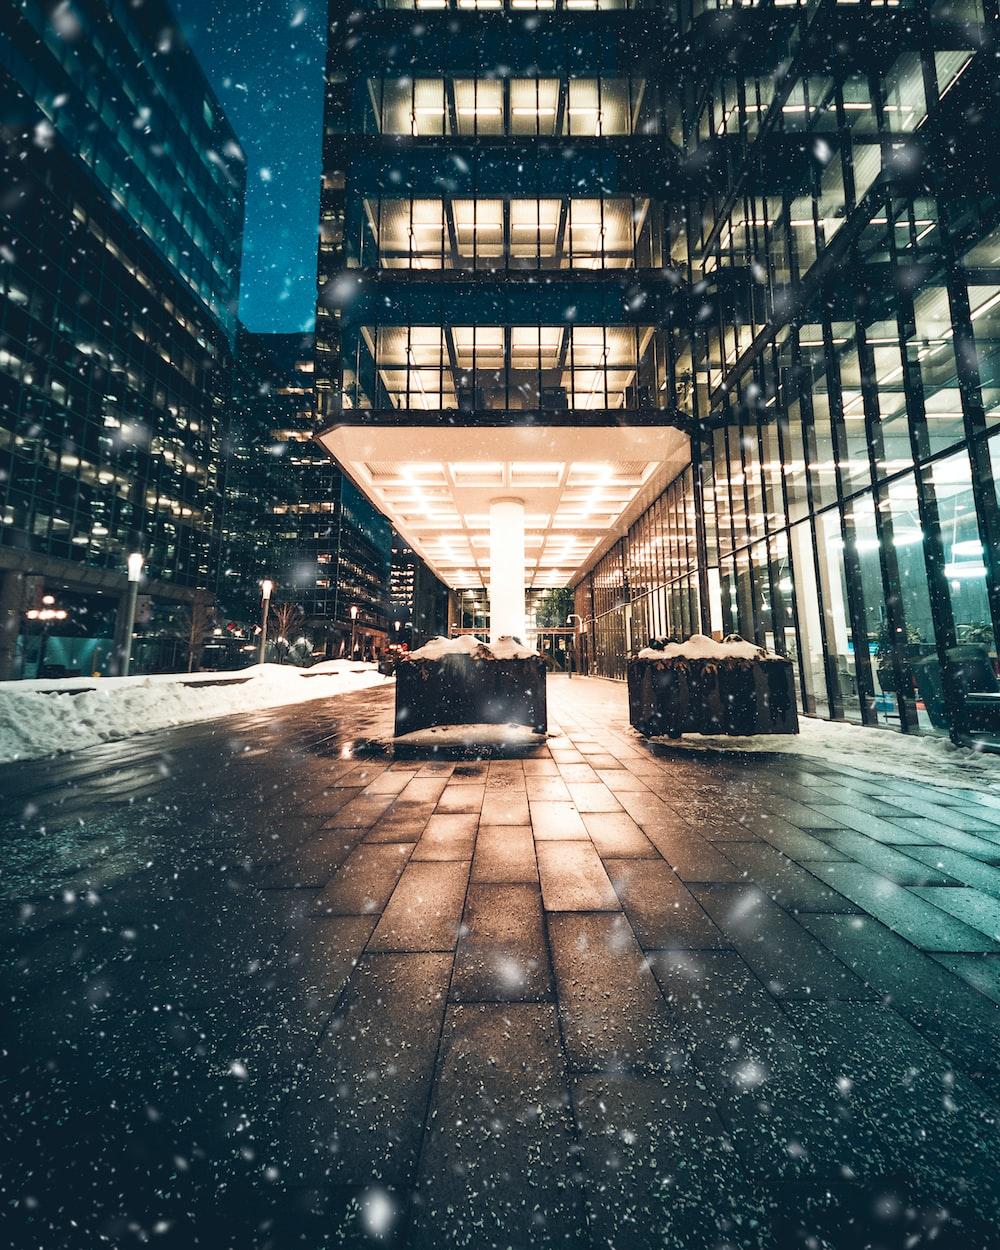 snow street during night time